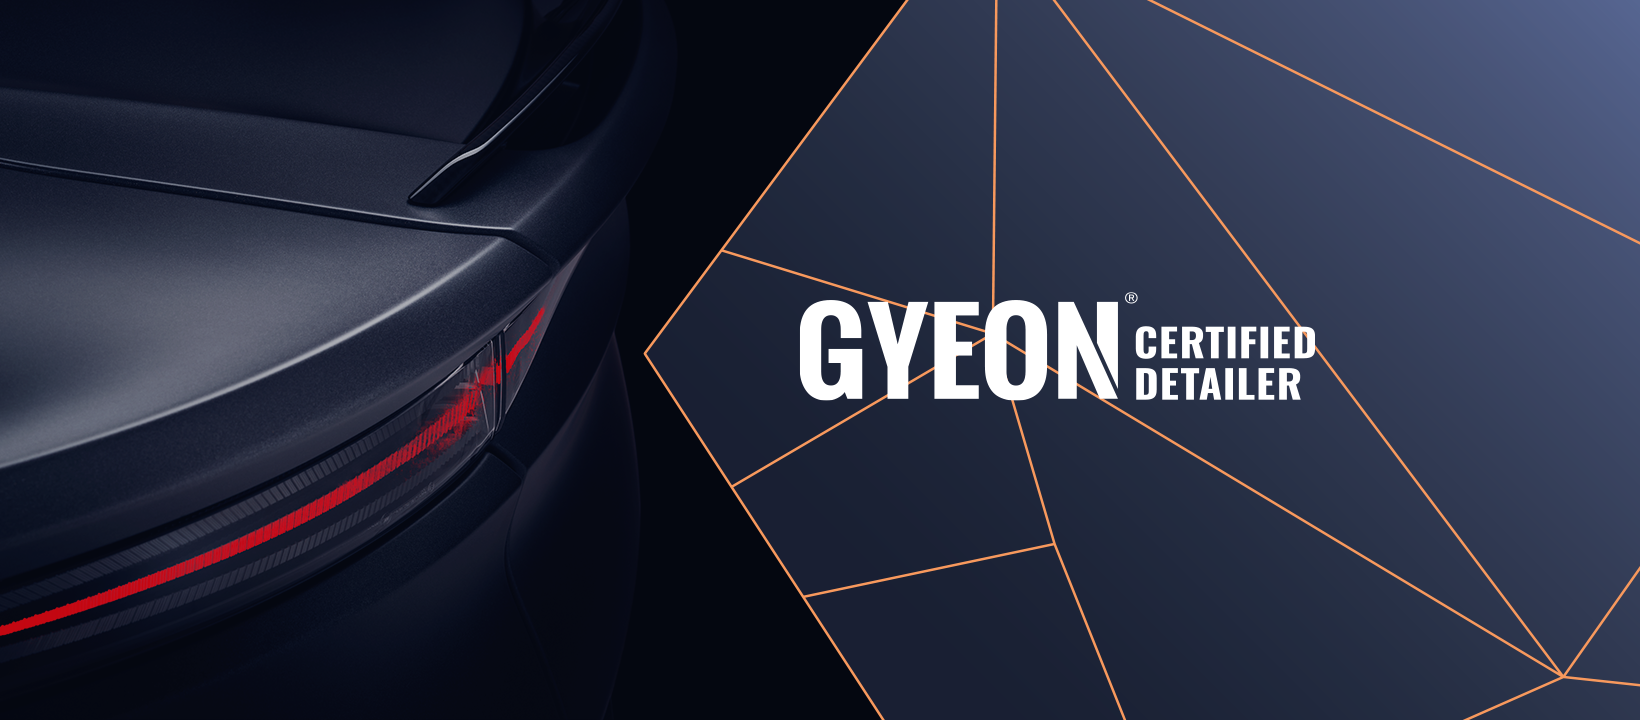 gyeon_fb_cover_certidieddetailer_03